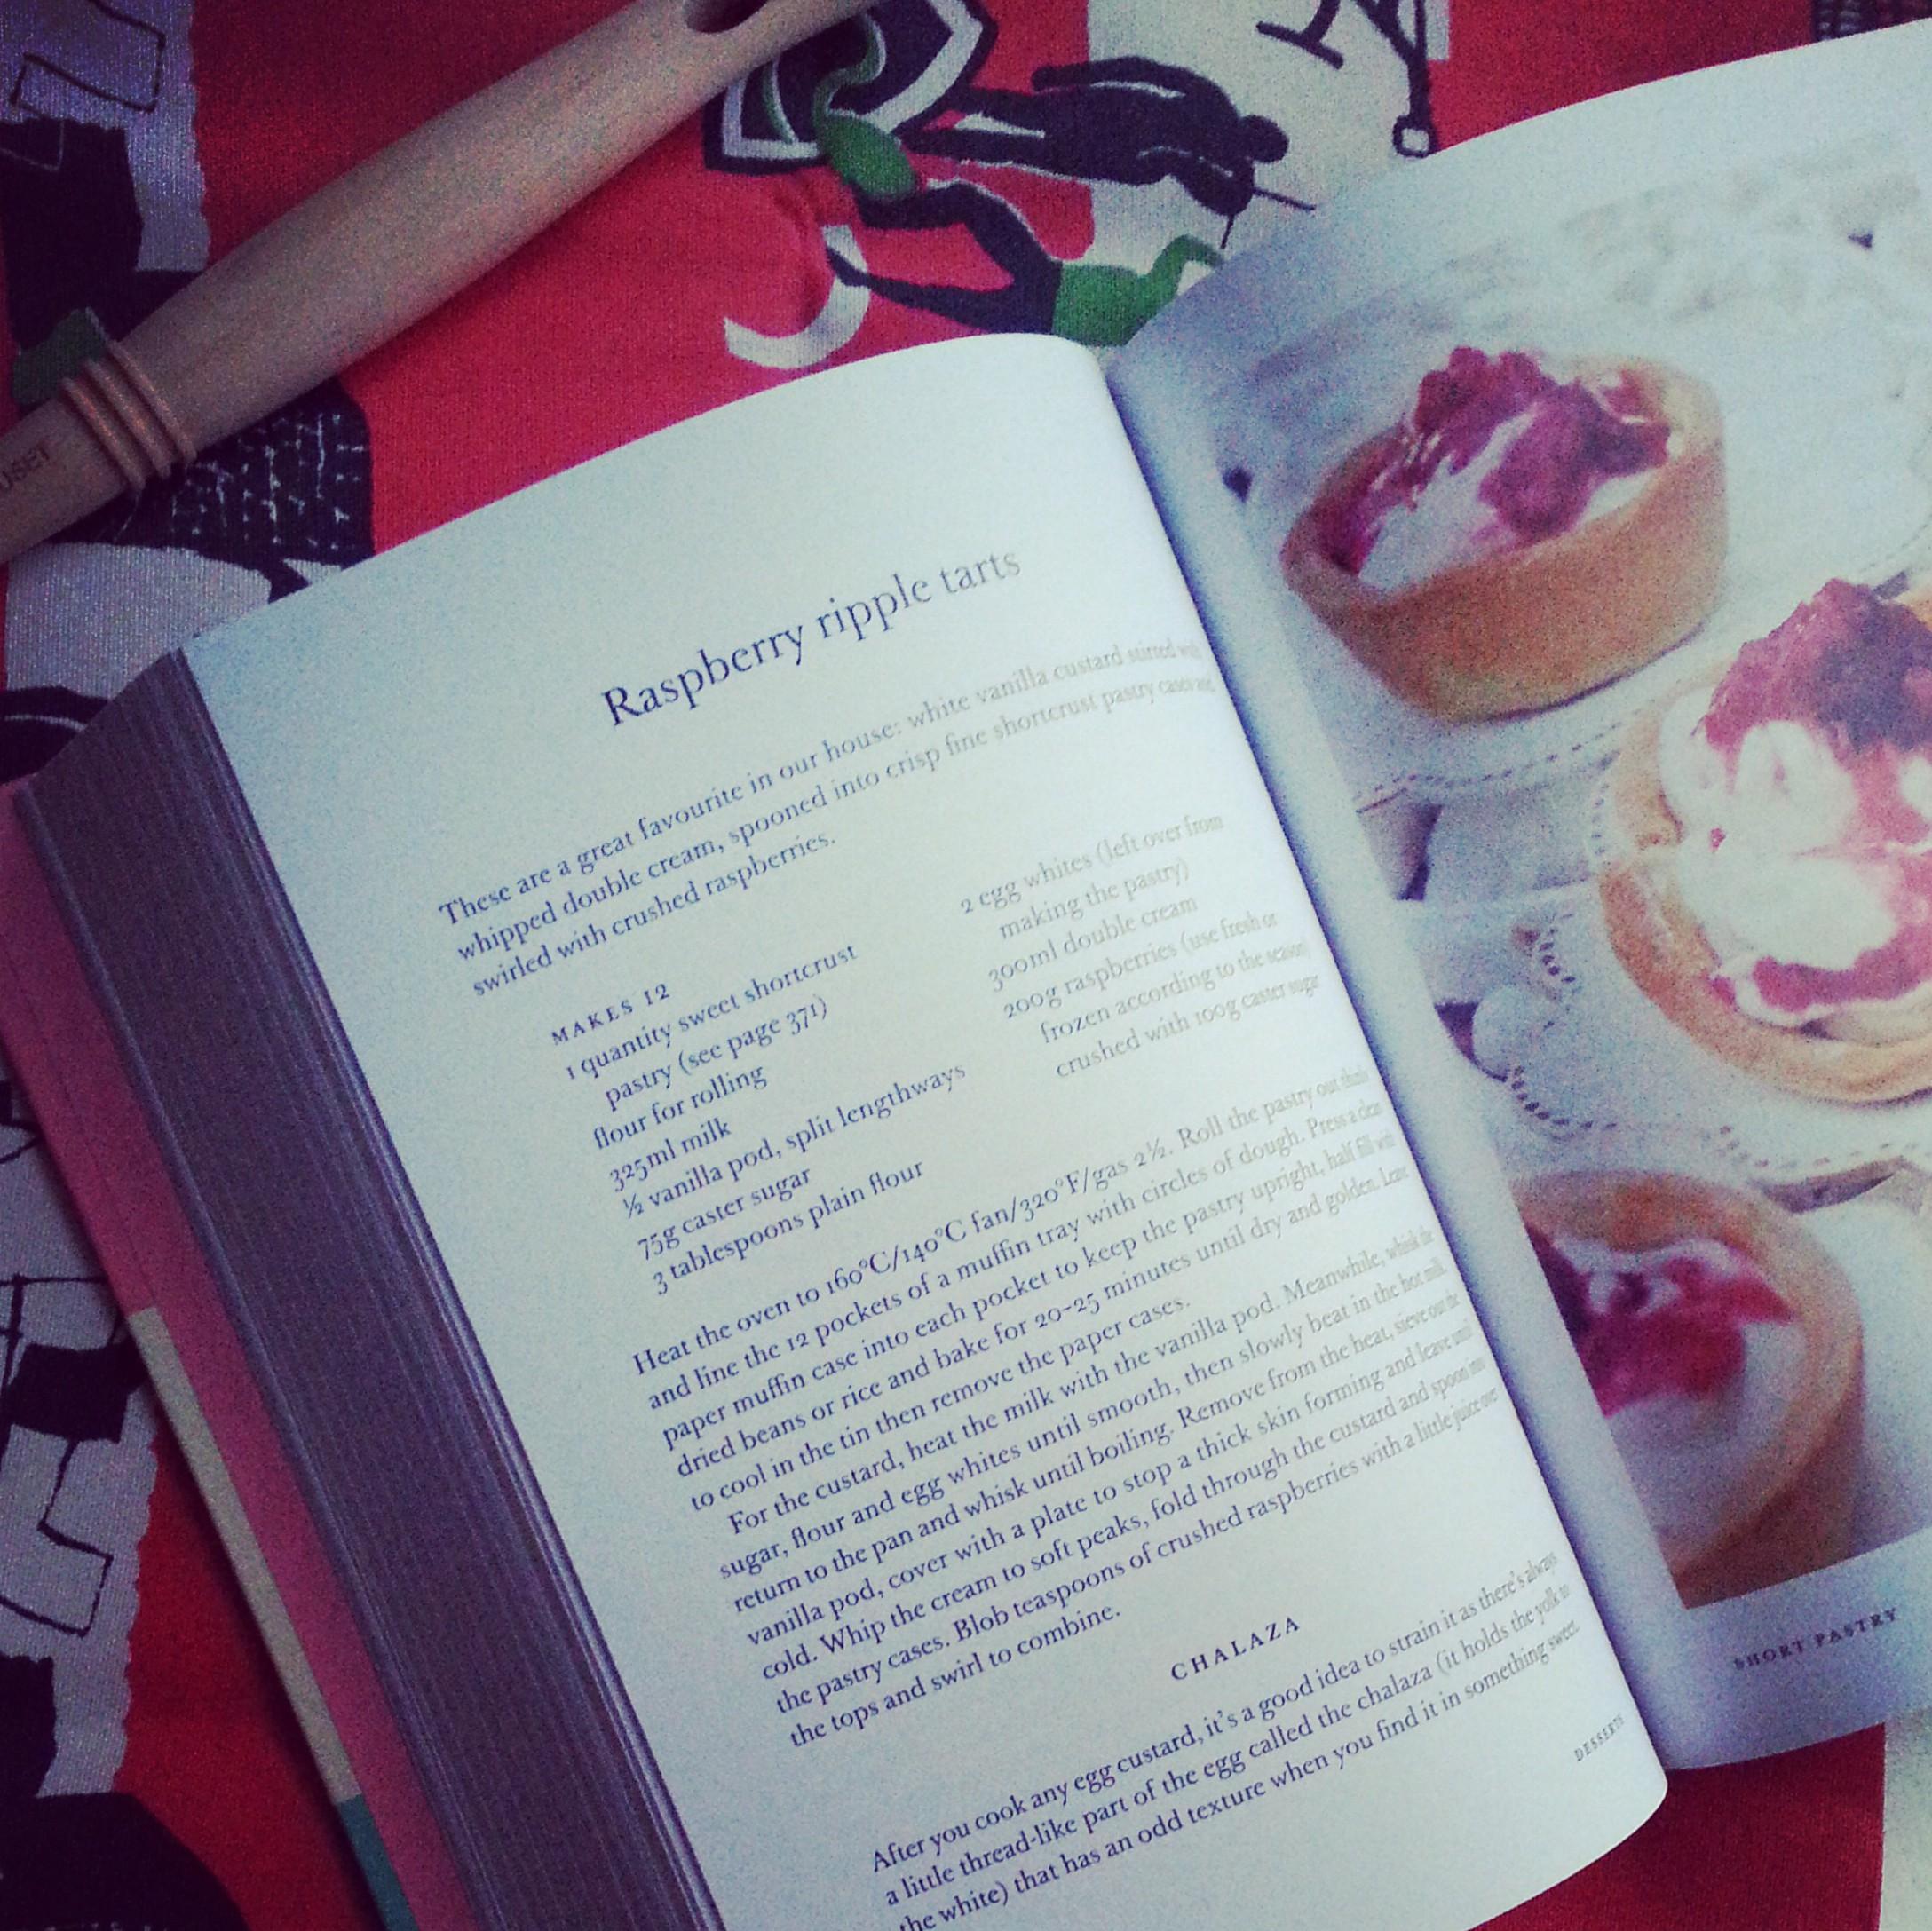 Raspberry Ripple Tarts recipe